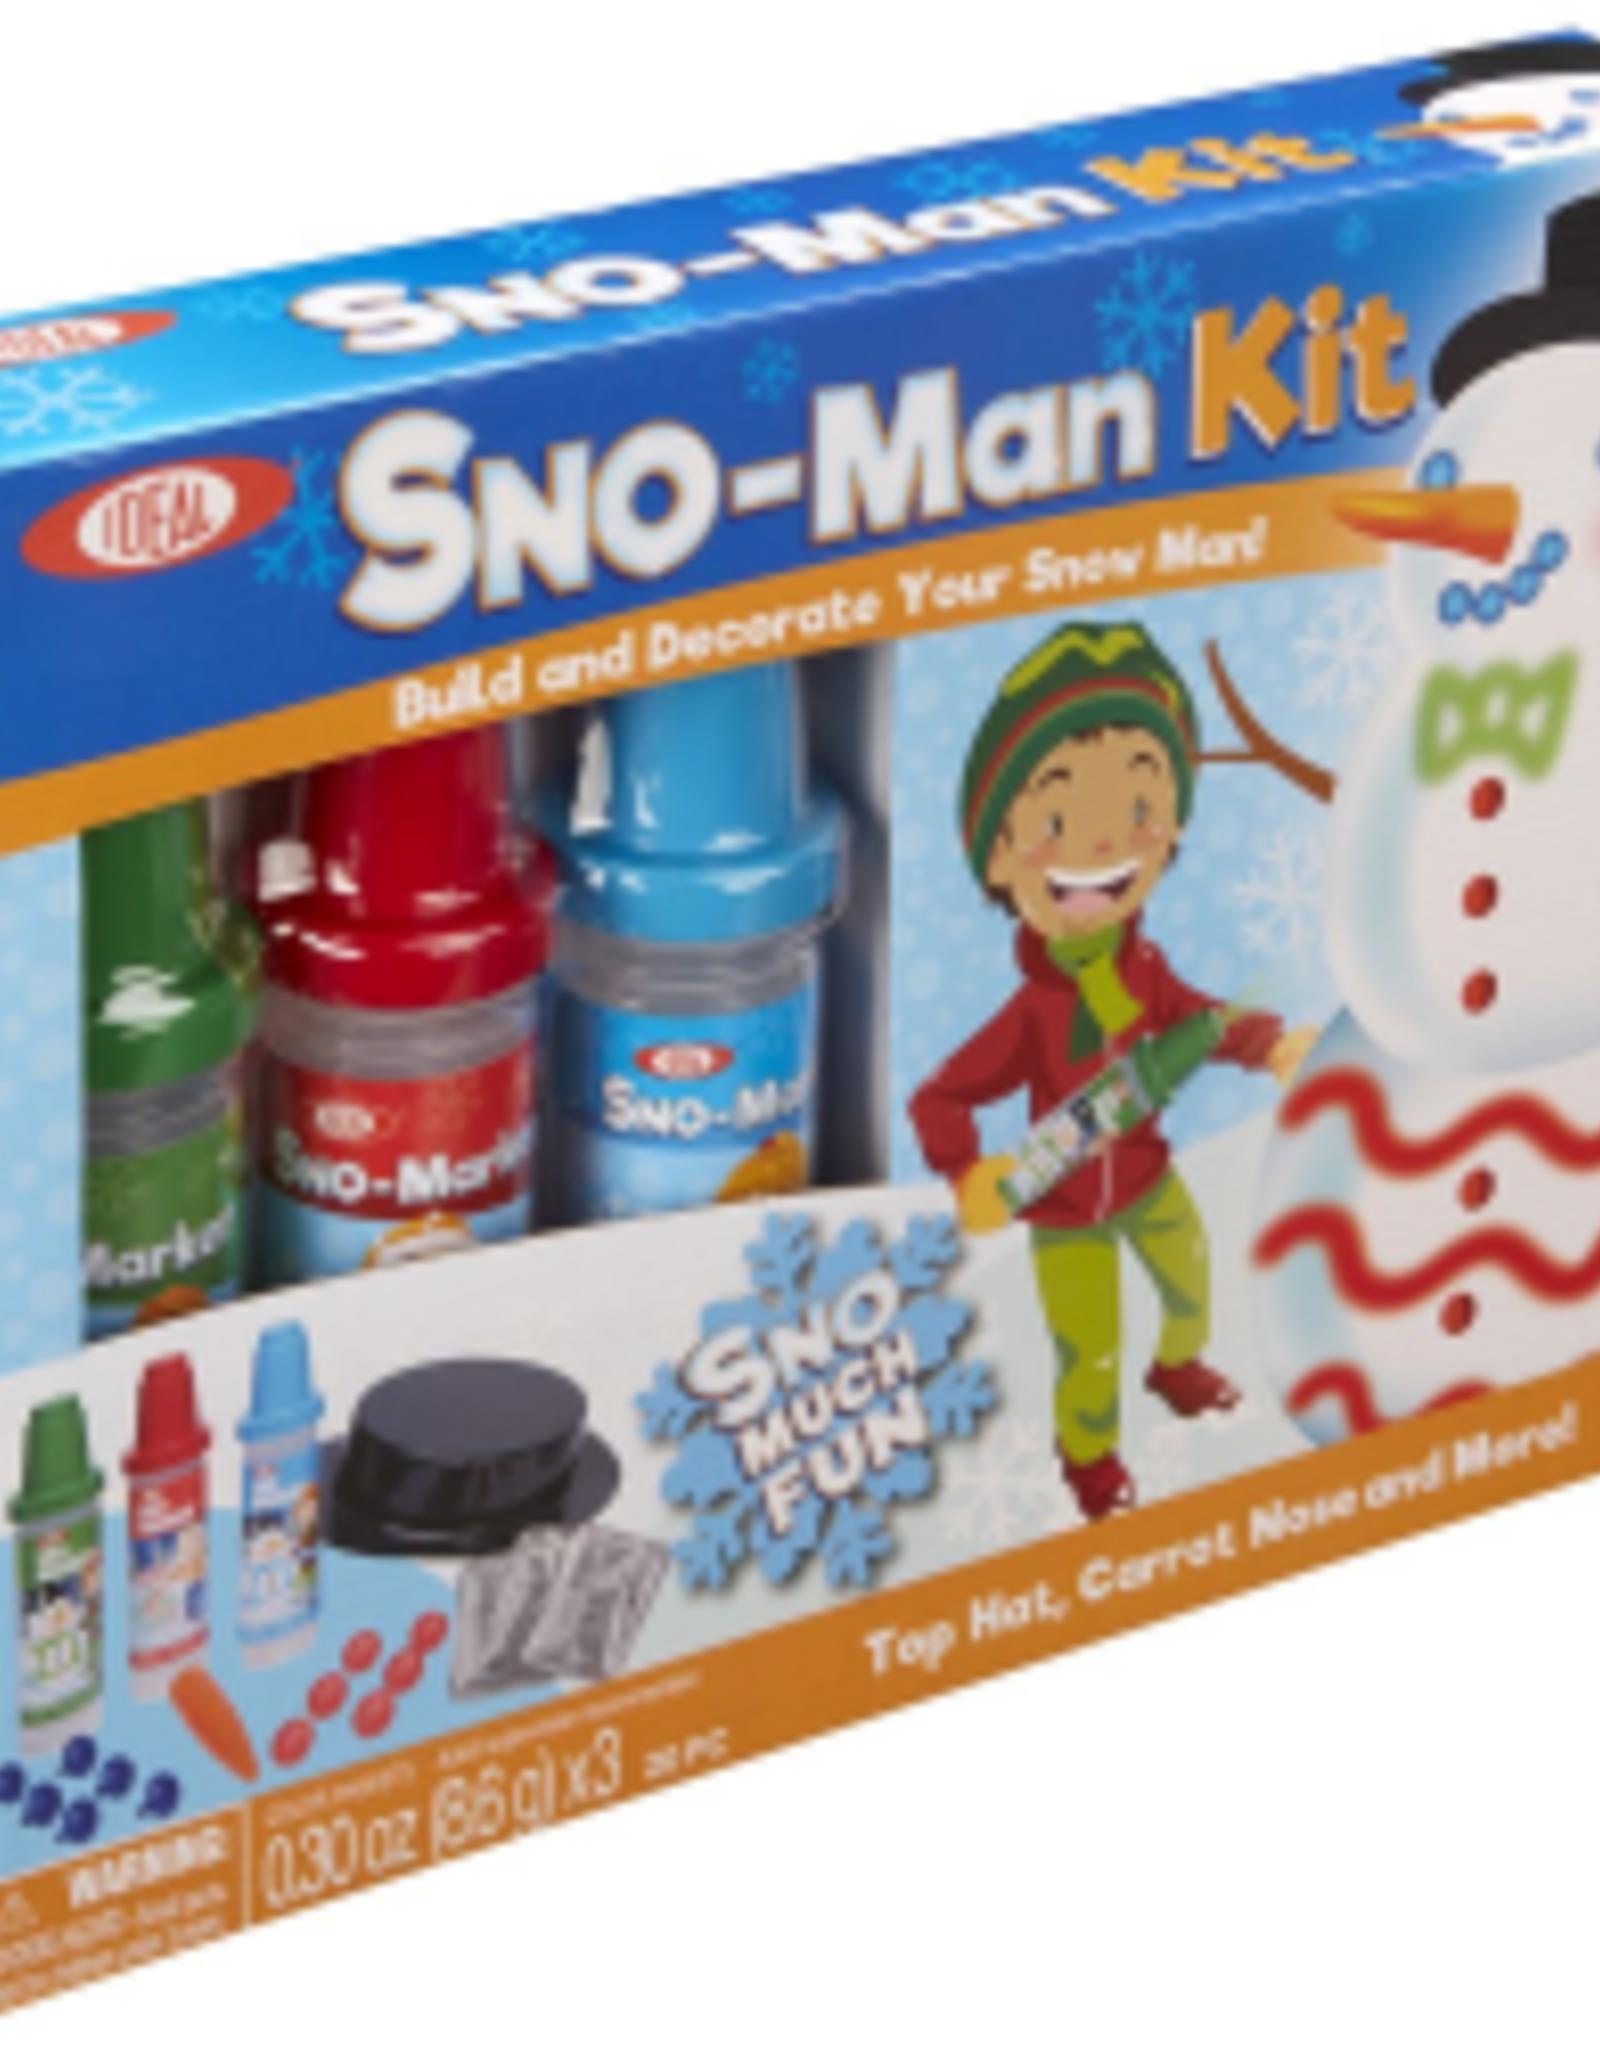 Ideal Sno-man Kit